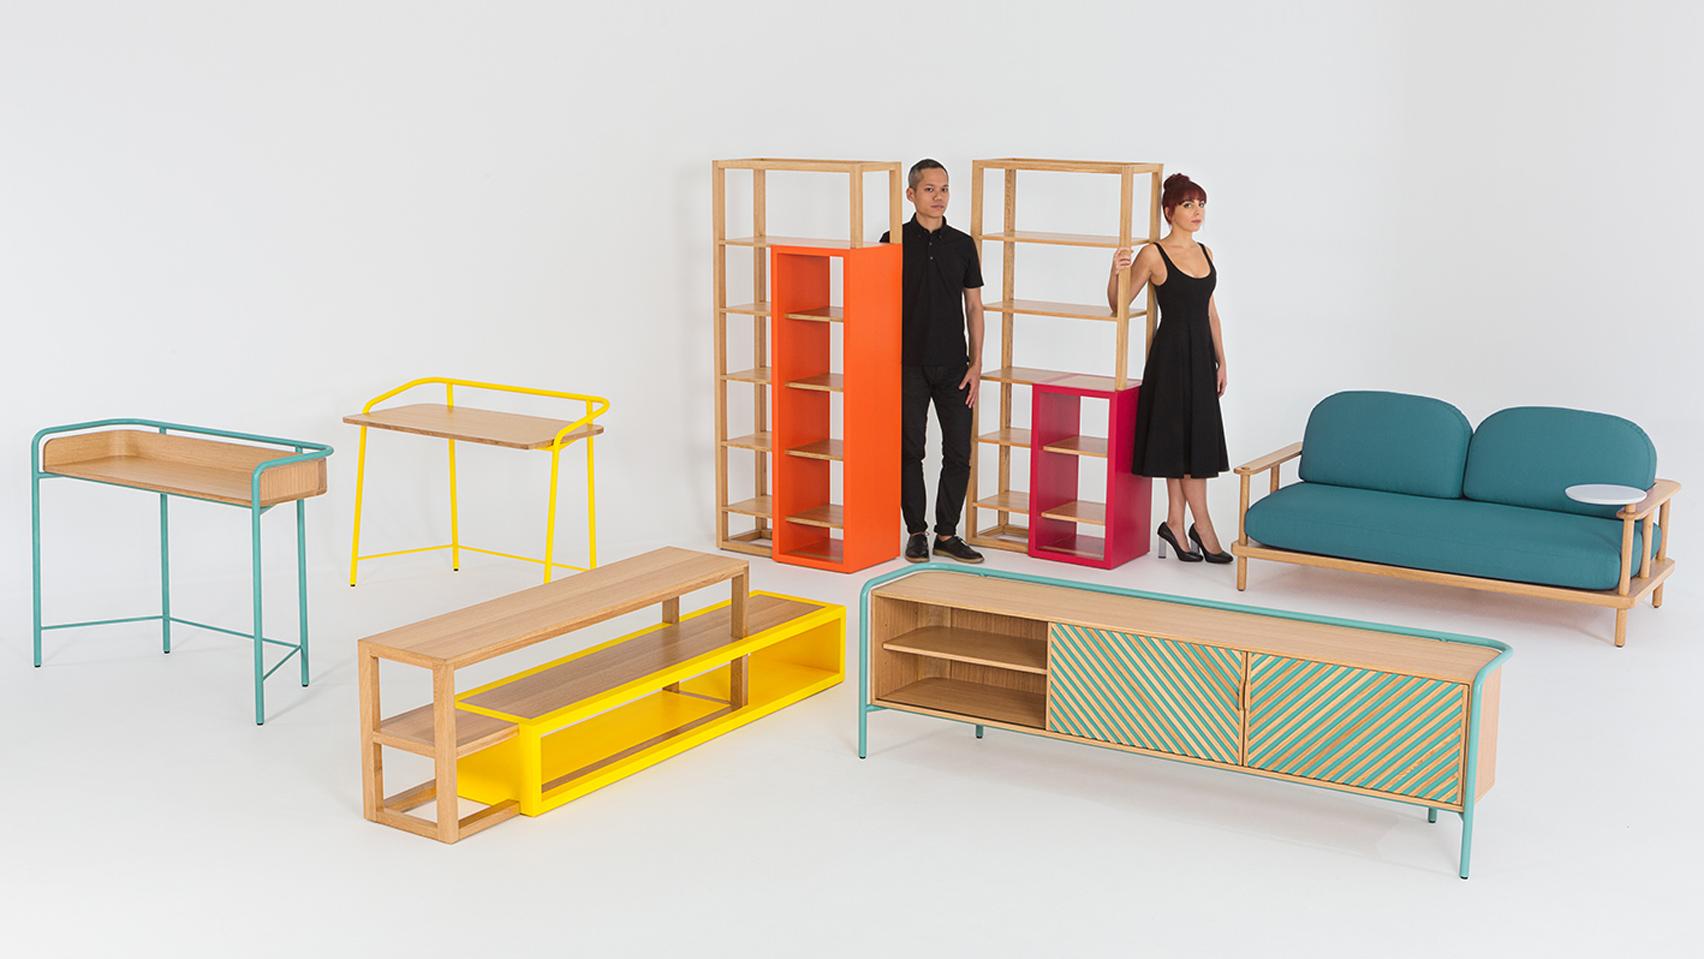 play-play-collection-2-journey-east-lanzavecchia-wai-furniture-design_dezeen_hero